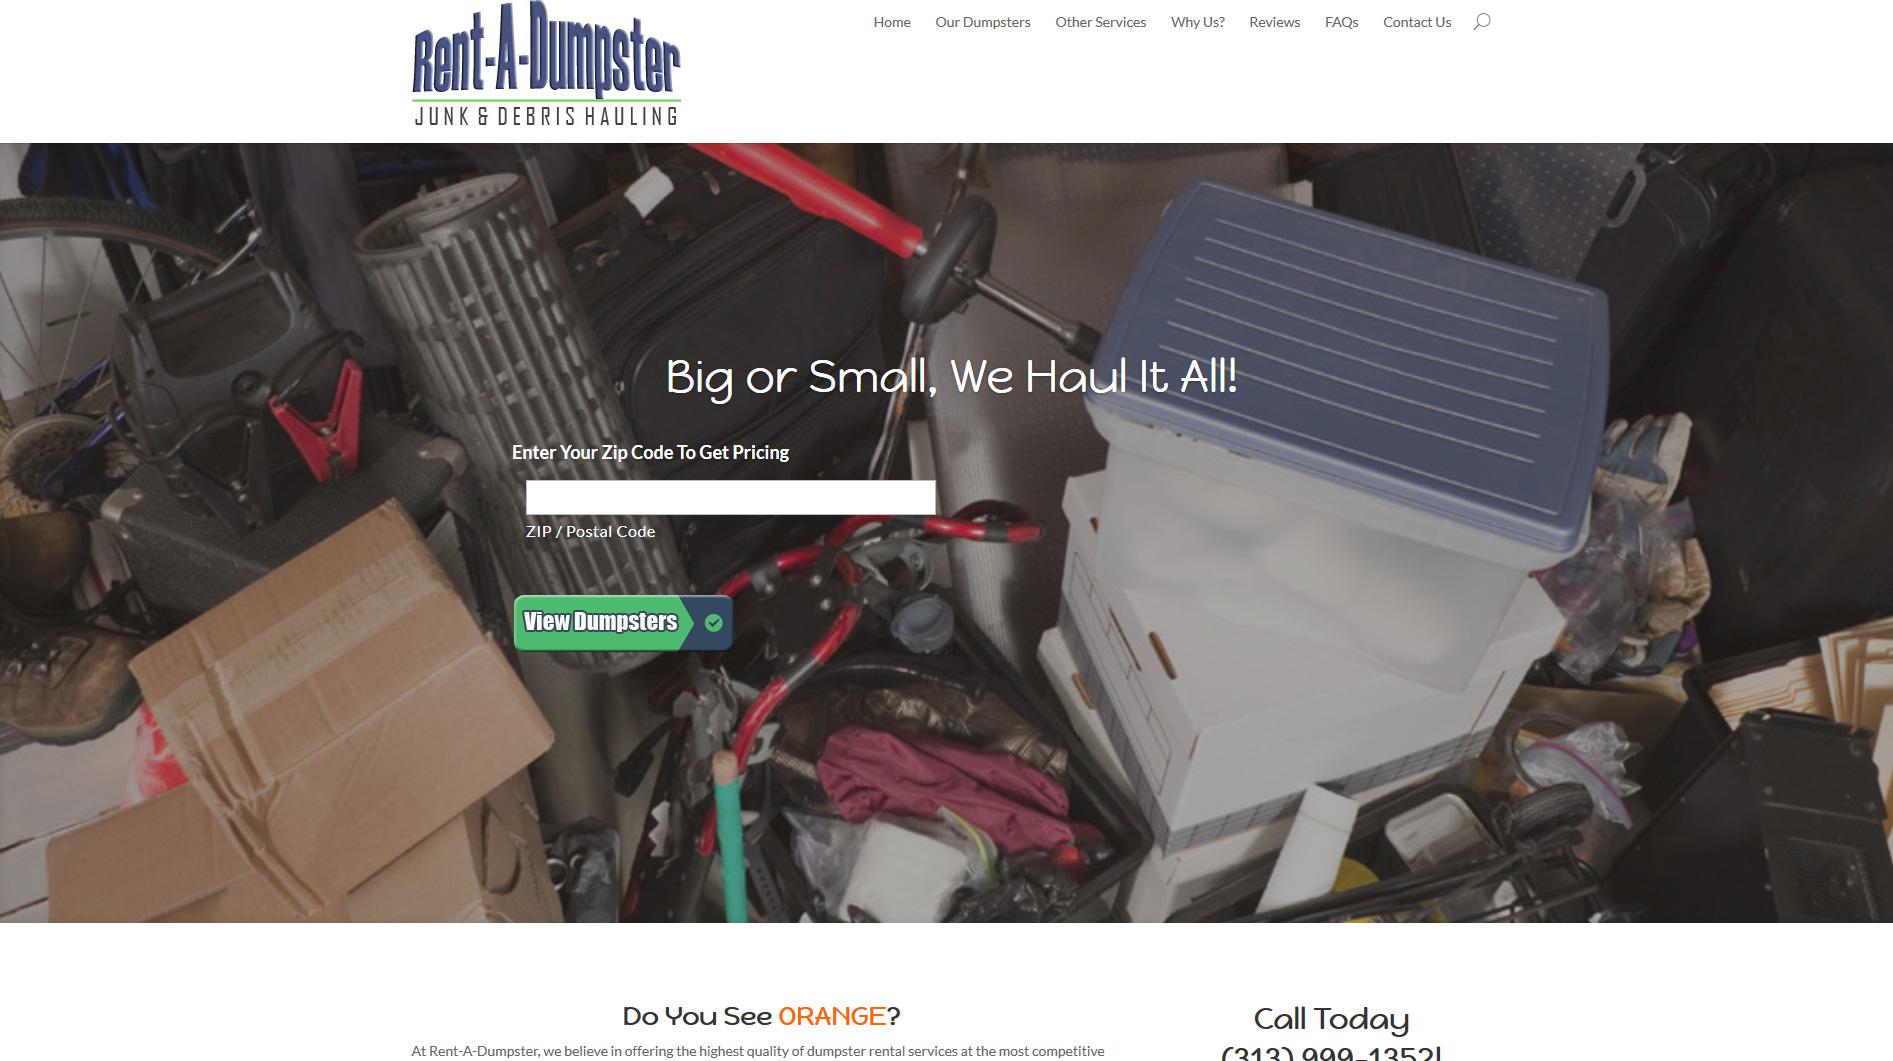 Responsive Web Design Michigan Web Design Smart Link Solutions - Que es us zip code